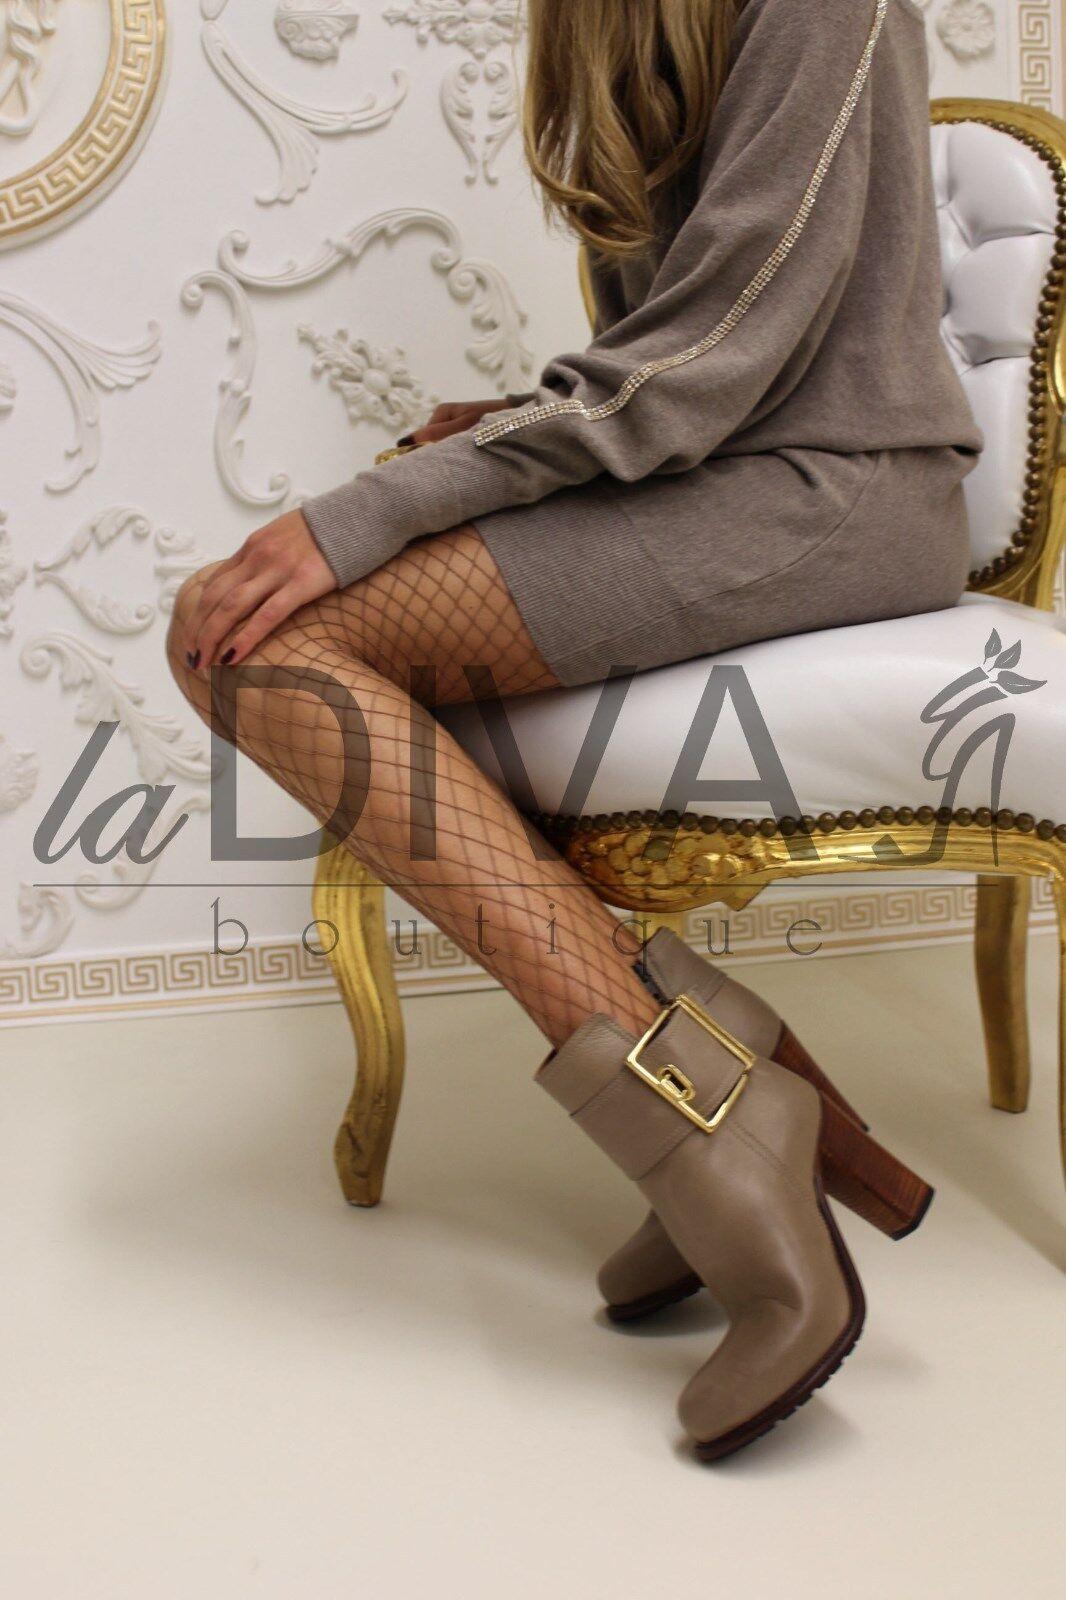 NAPOLEONI   Leder Stiefel Stiefelette OVP 36 taupe braun %SALE% OVP Stiefelette 219,- 65b3b8